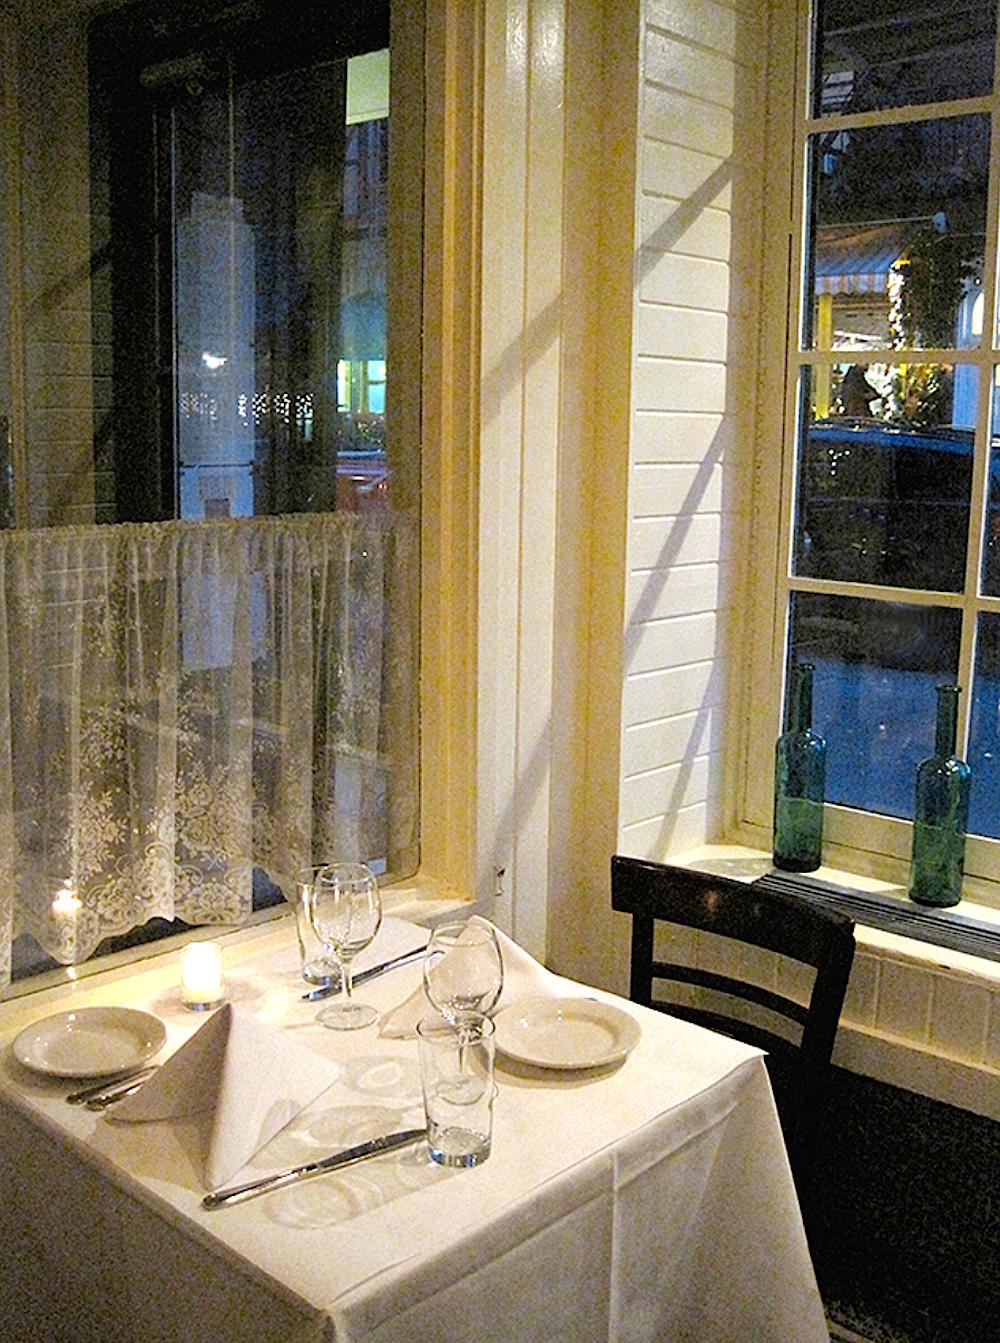 po-restaurant-cornelia-street